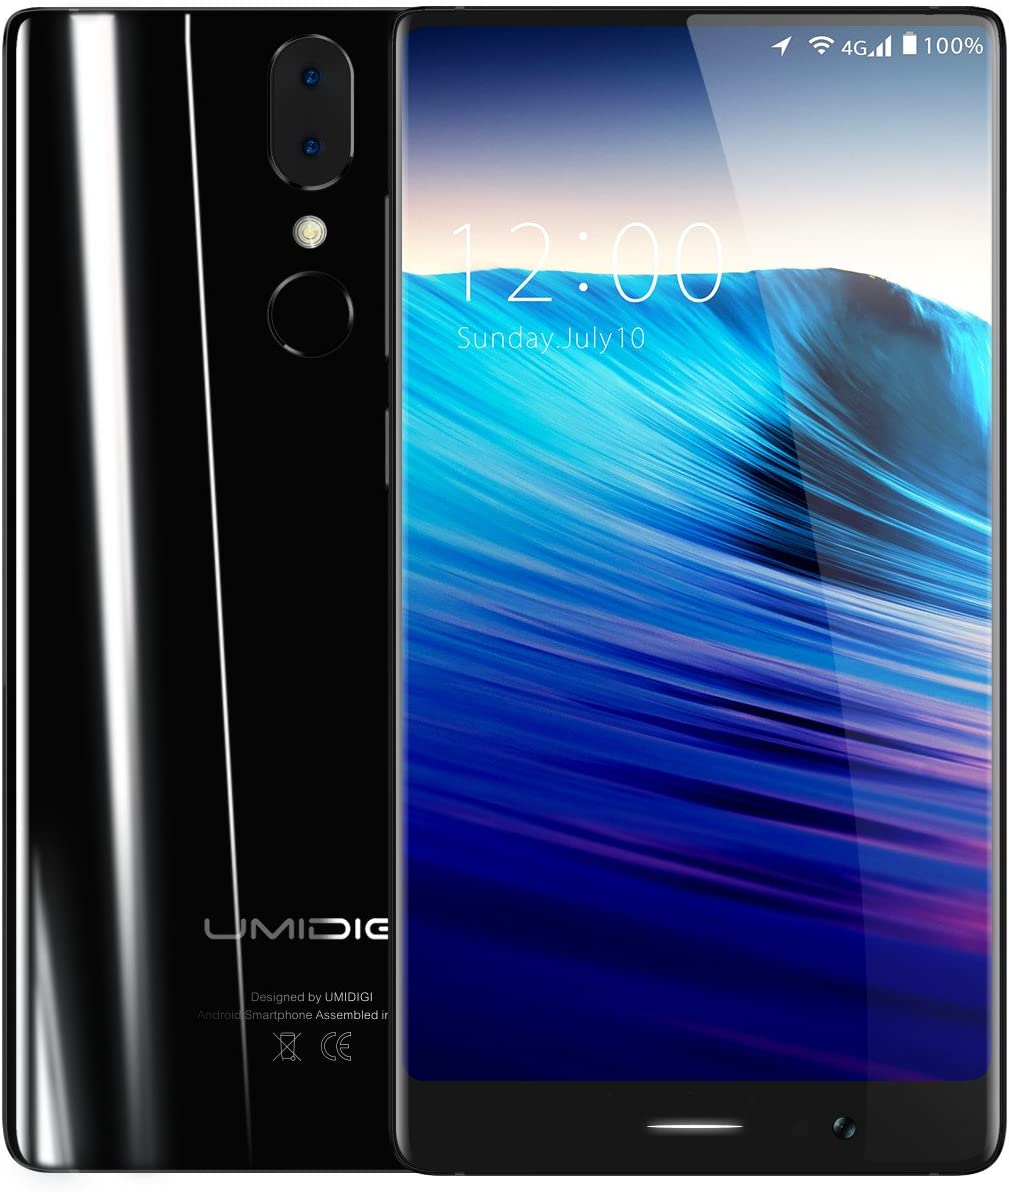 UMIDIGI Crystal Smartphone Libre 2GB+16GB/4GB+64GB (2GB+6GB): Amazon.es: Electrónica